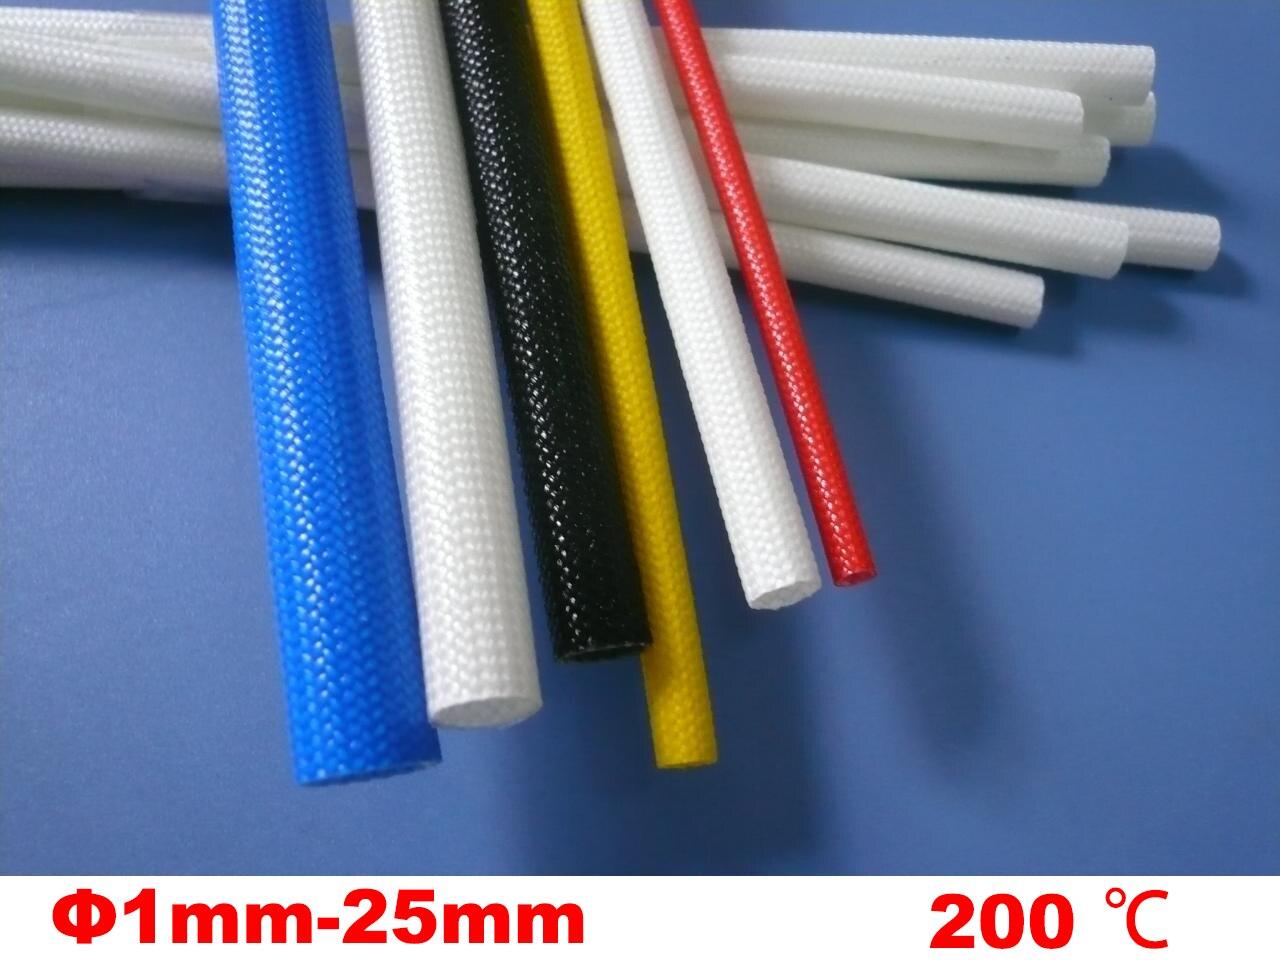 4M 12mm Black White 200 Deg C High Temperature off-Self Casing Pipe Silicone Resin Braided Glass Fiber Sleeve Fiberglass Tube